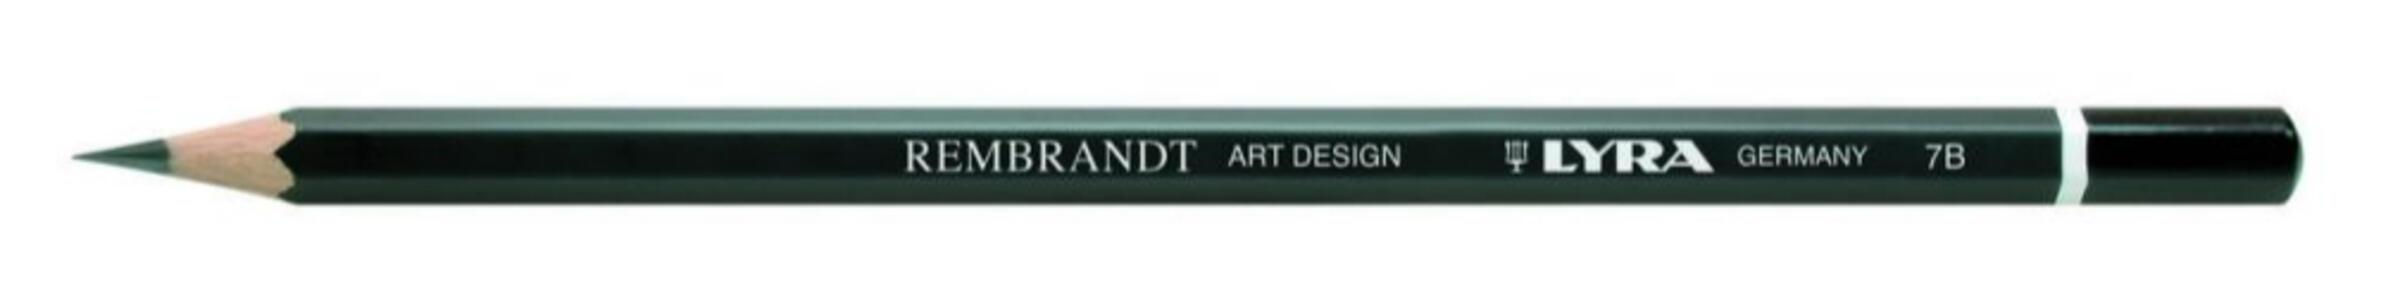 Matita Lyra Rembrandt Art Design - gradazione 7B